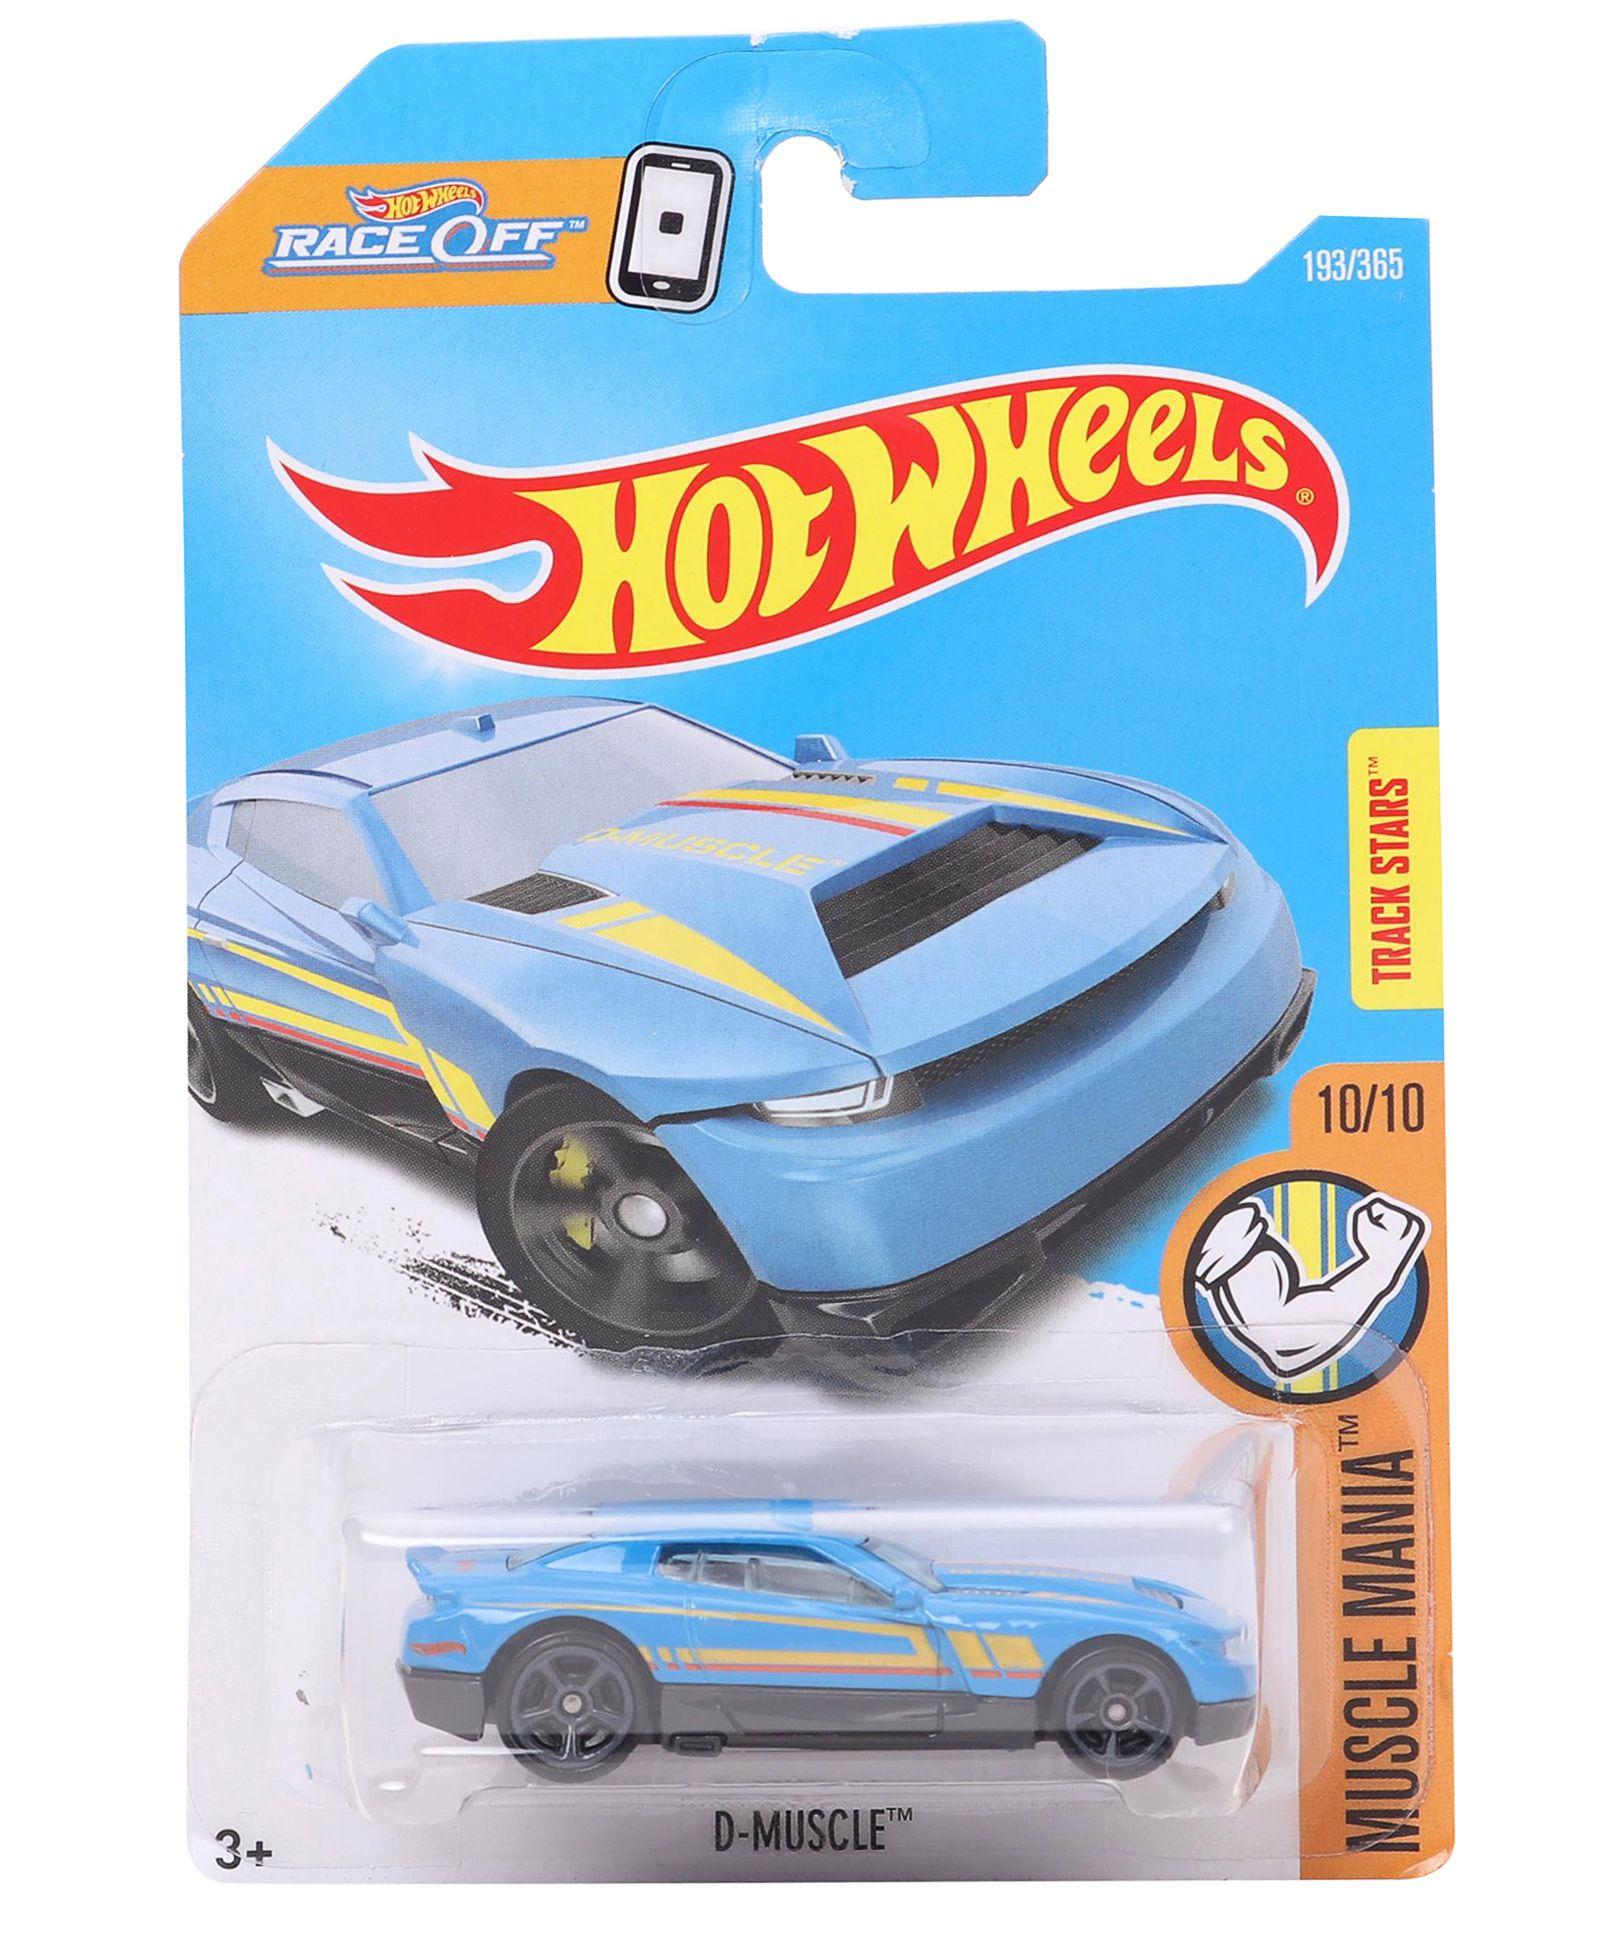 Hot Wheels D-Muscle Diecast Model